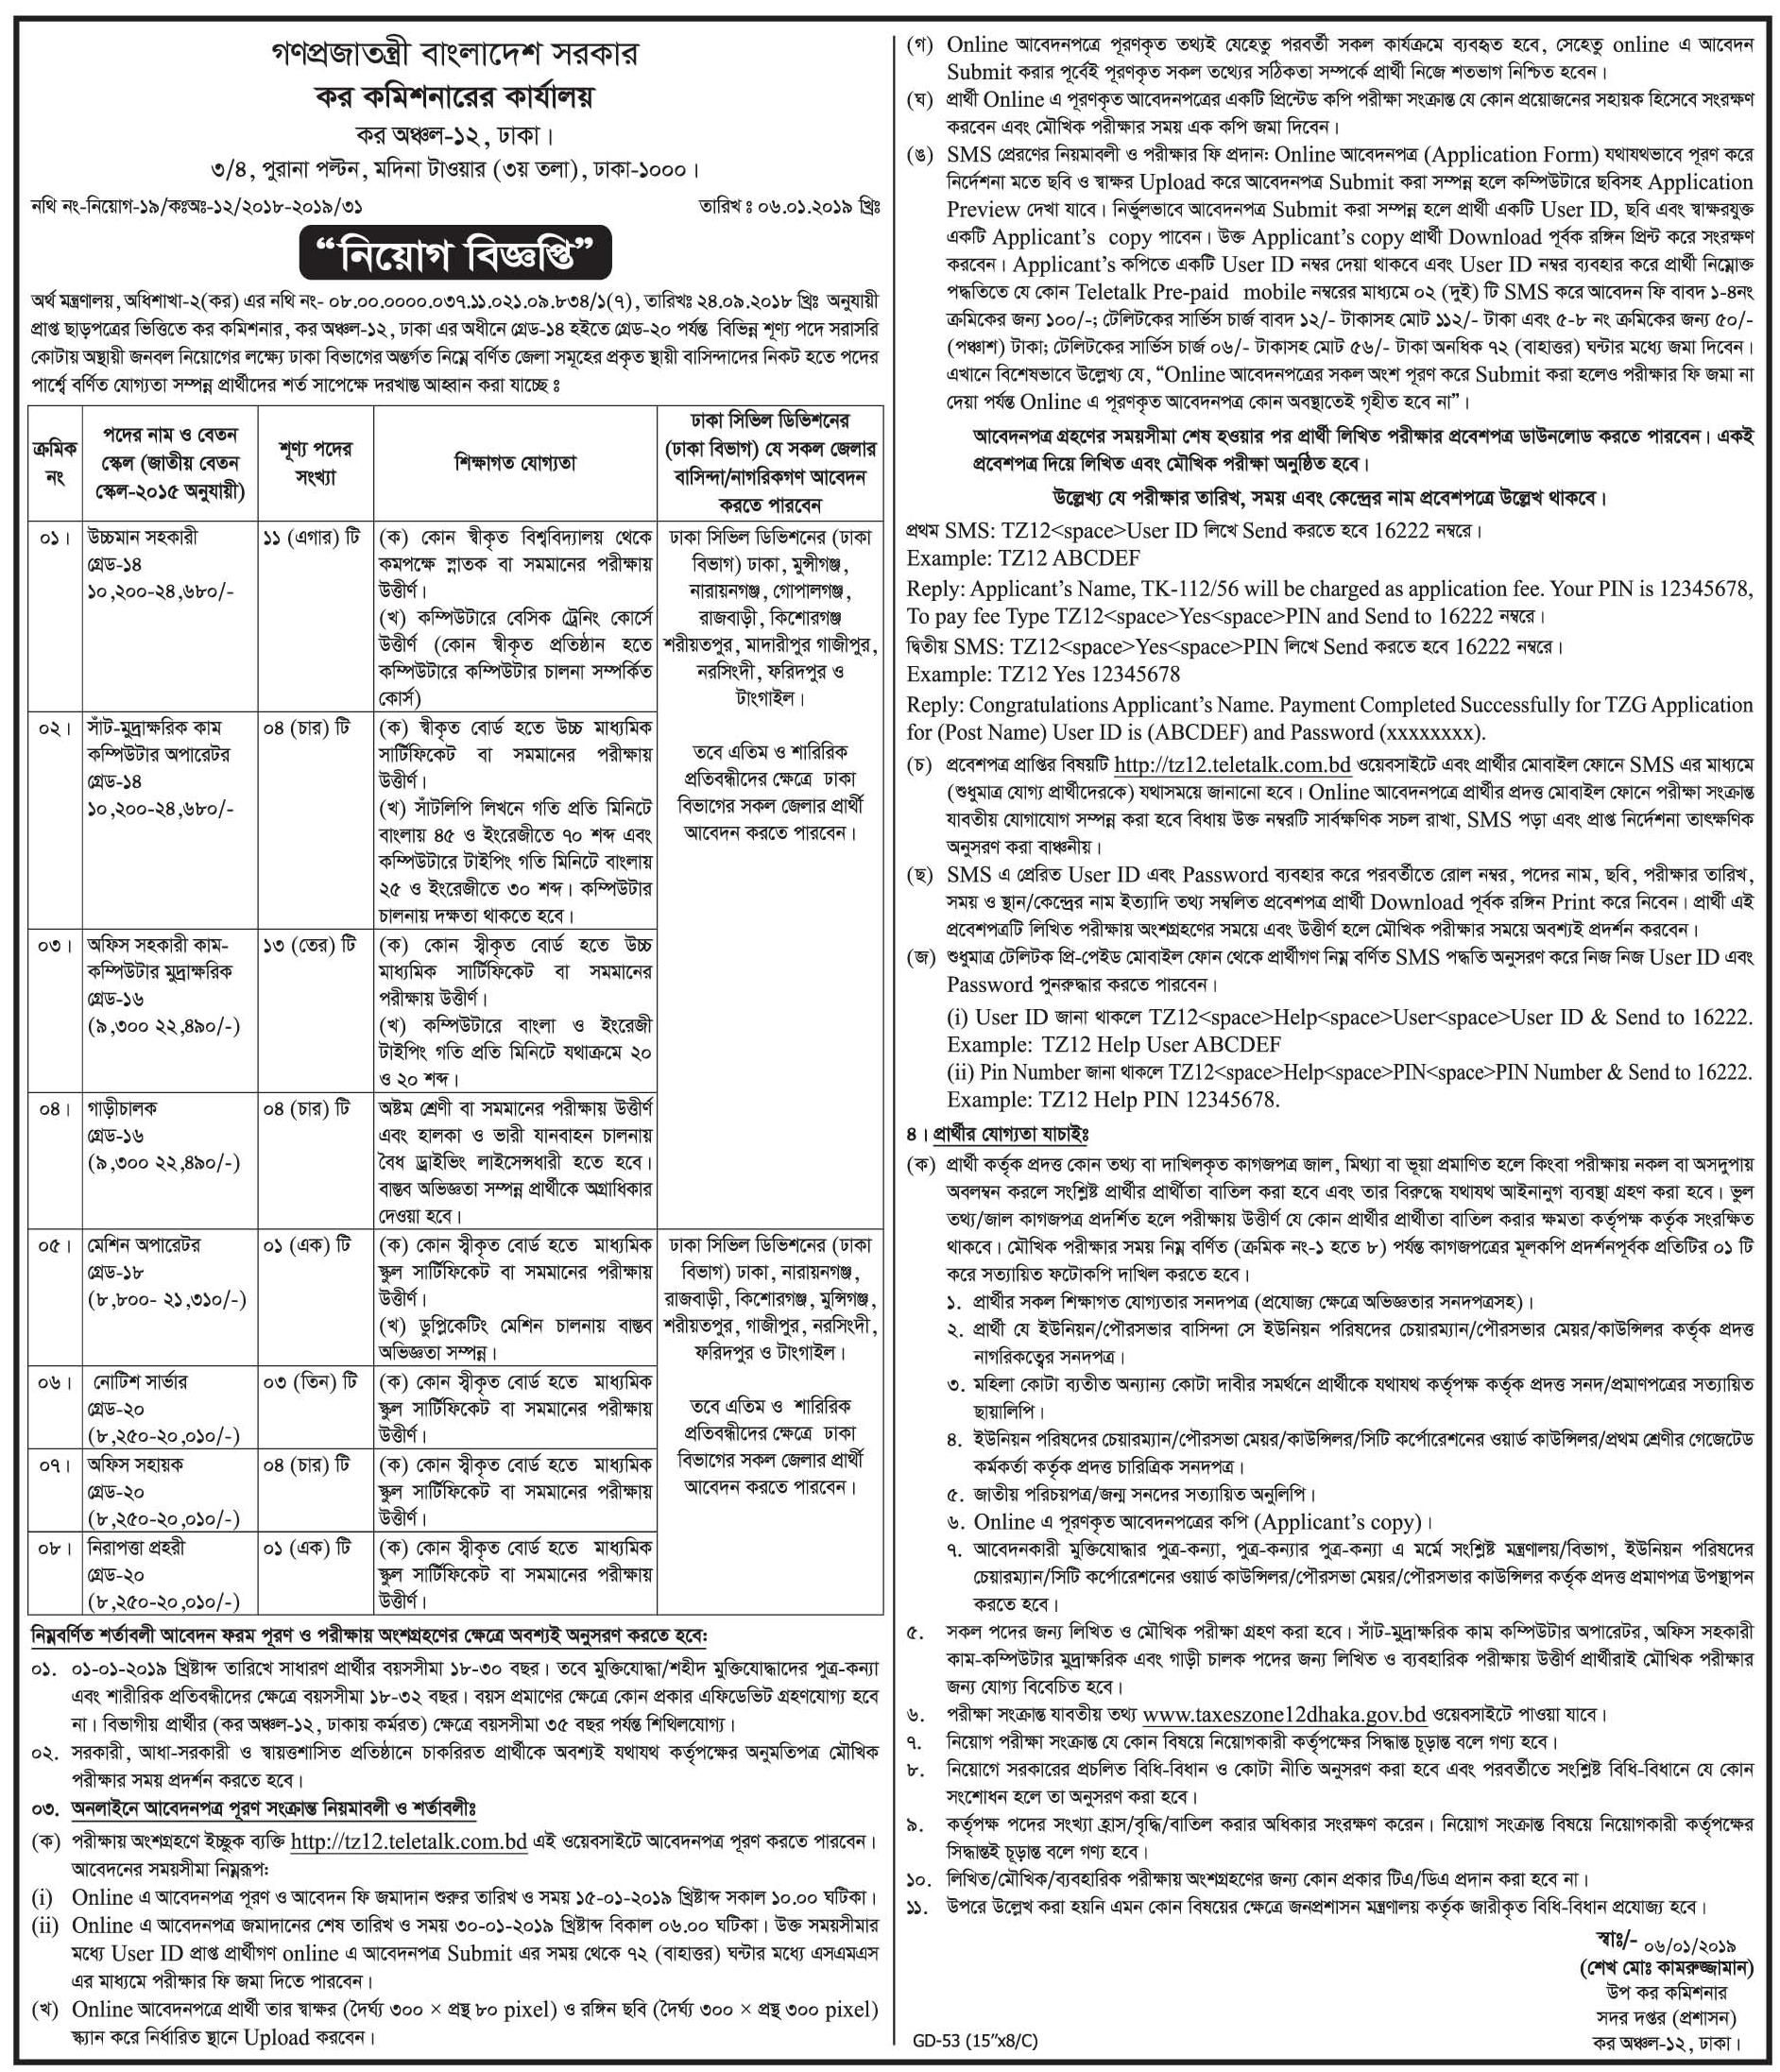 Tax Commission Office Job circular 2019 taxappealctg.gov